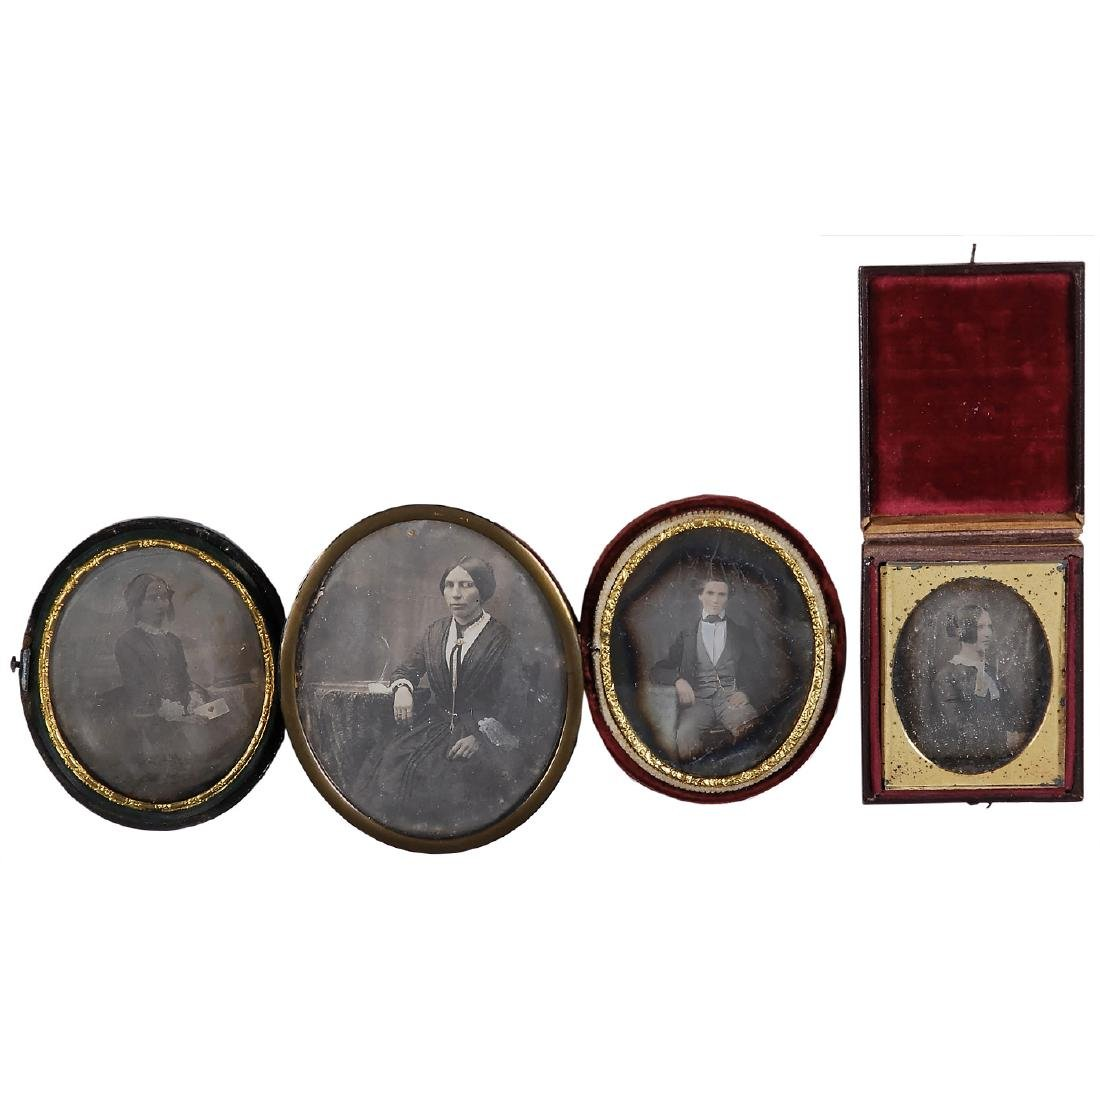 4 Daguerreotypes (Various Sizes), 1845-55